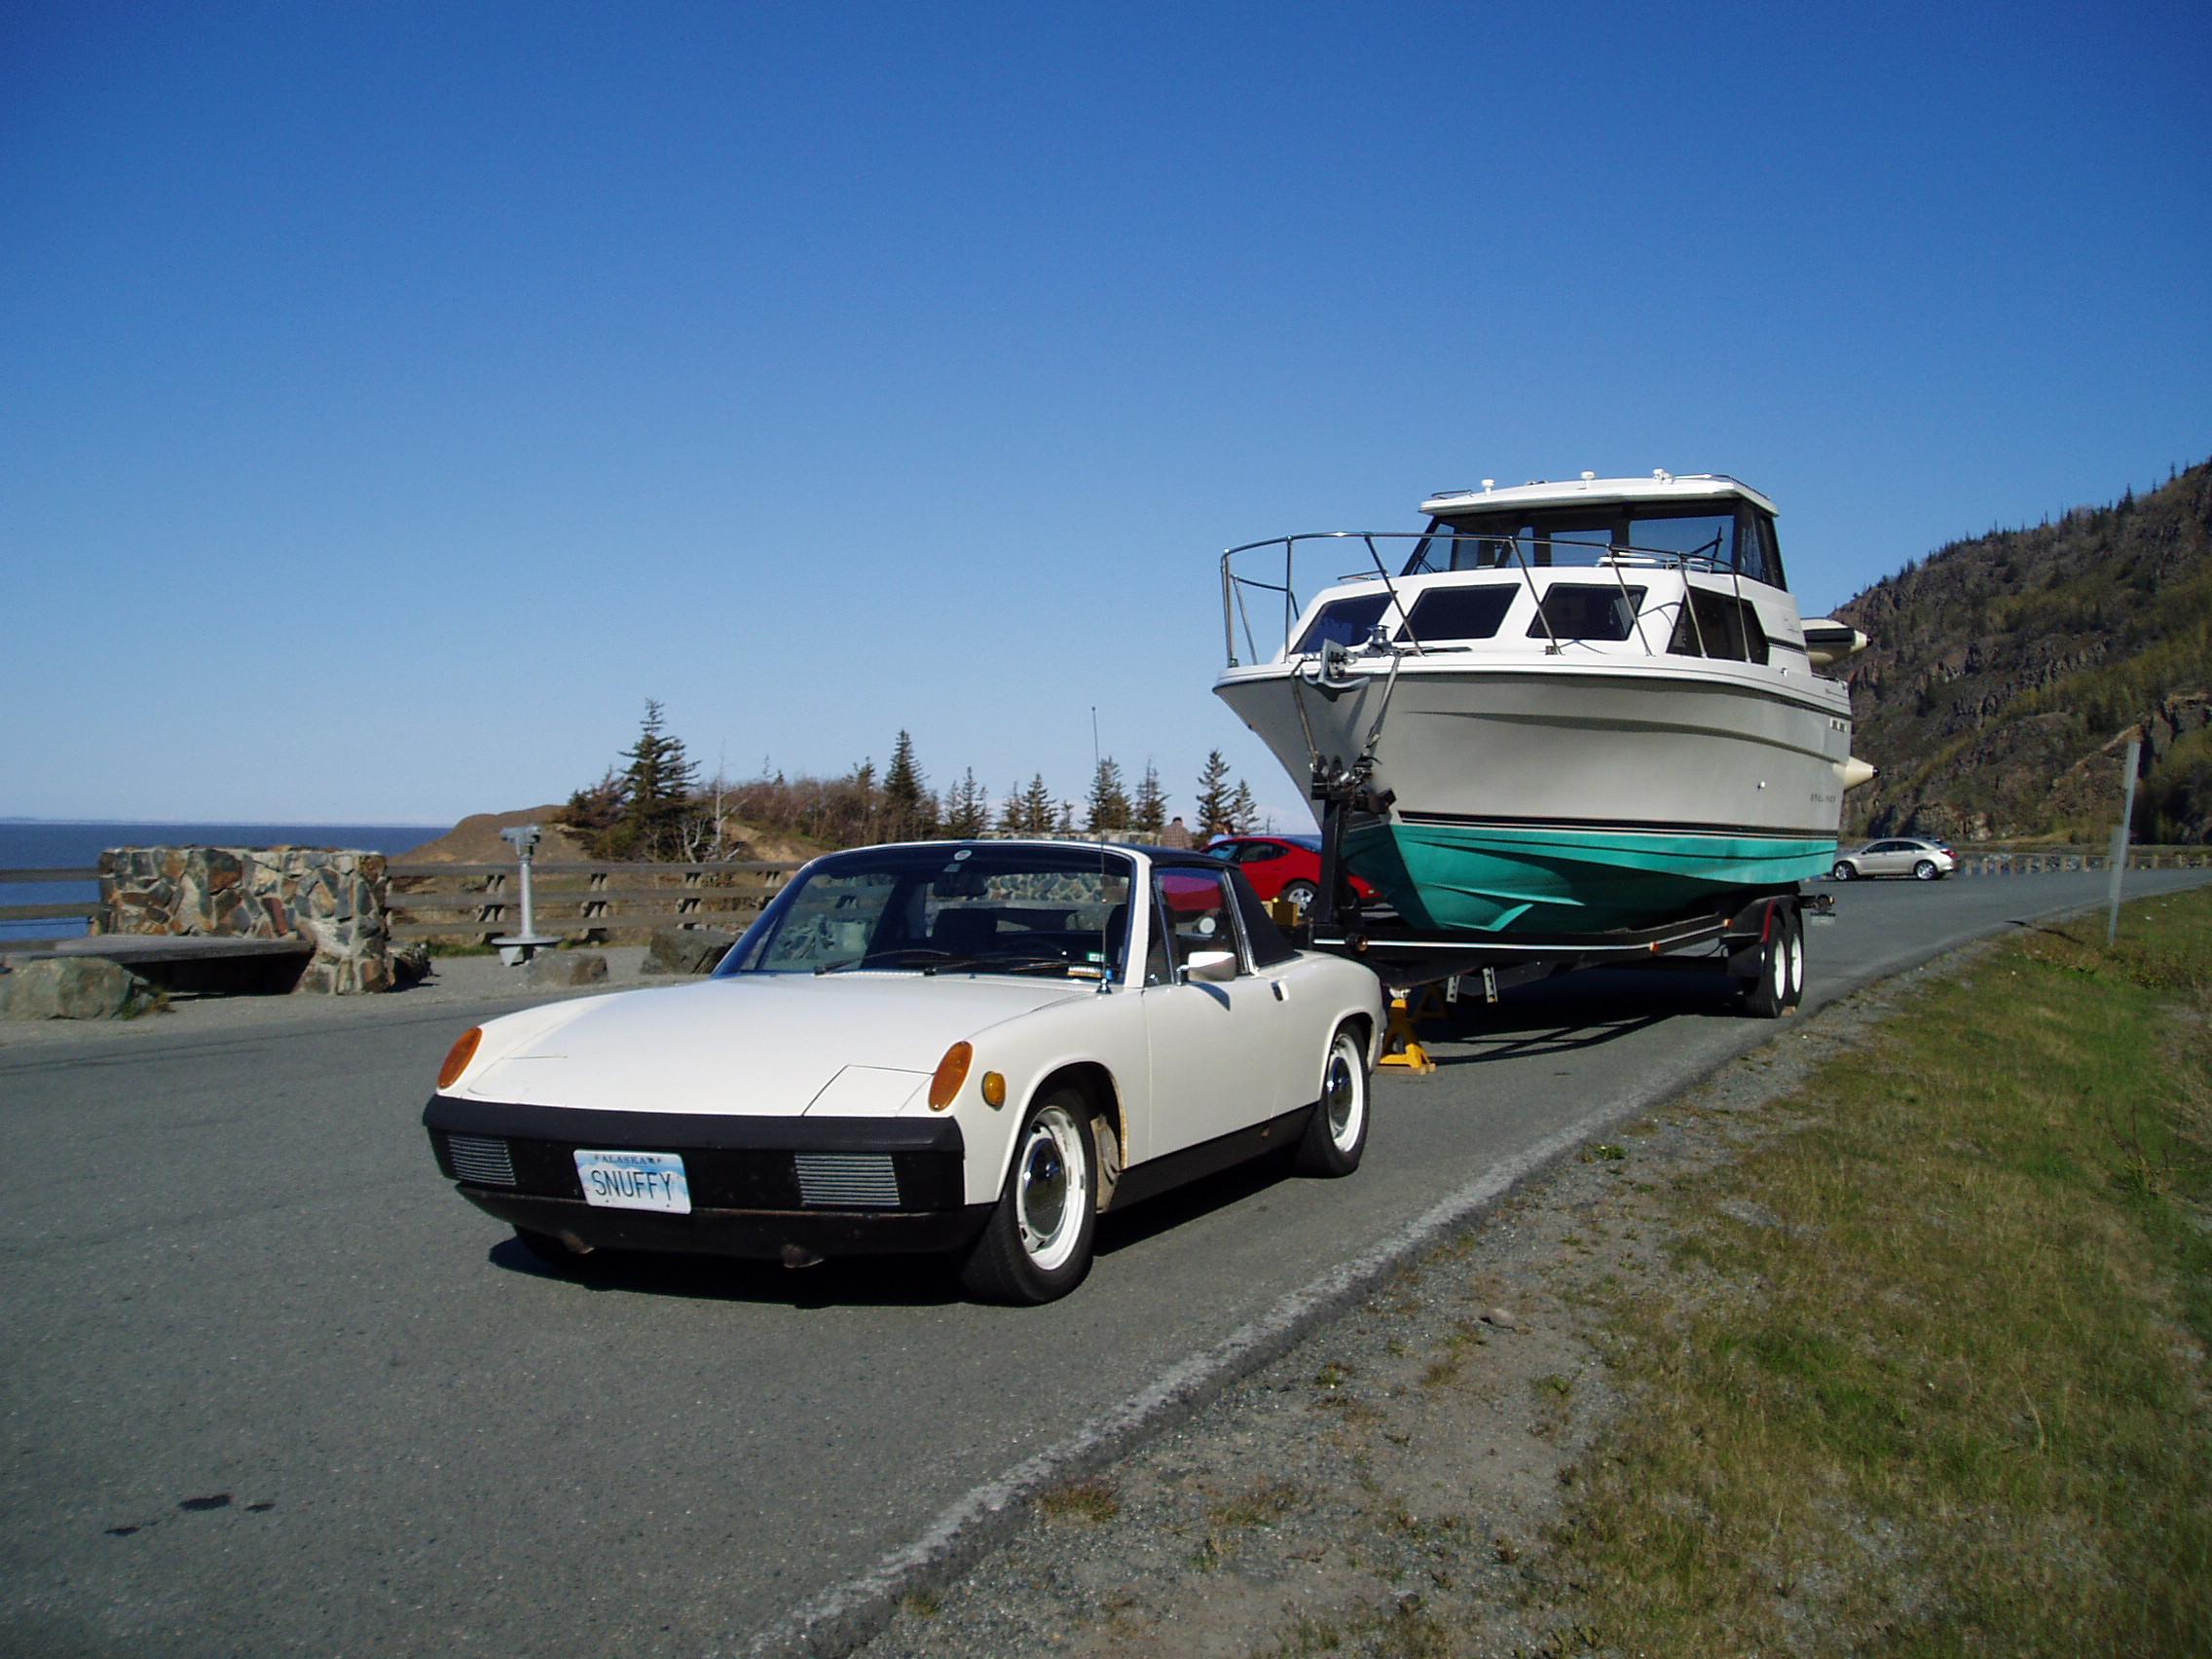 2007 road trip to Seward - Snuffy towing a boat!!